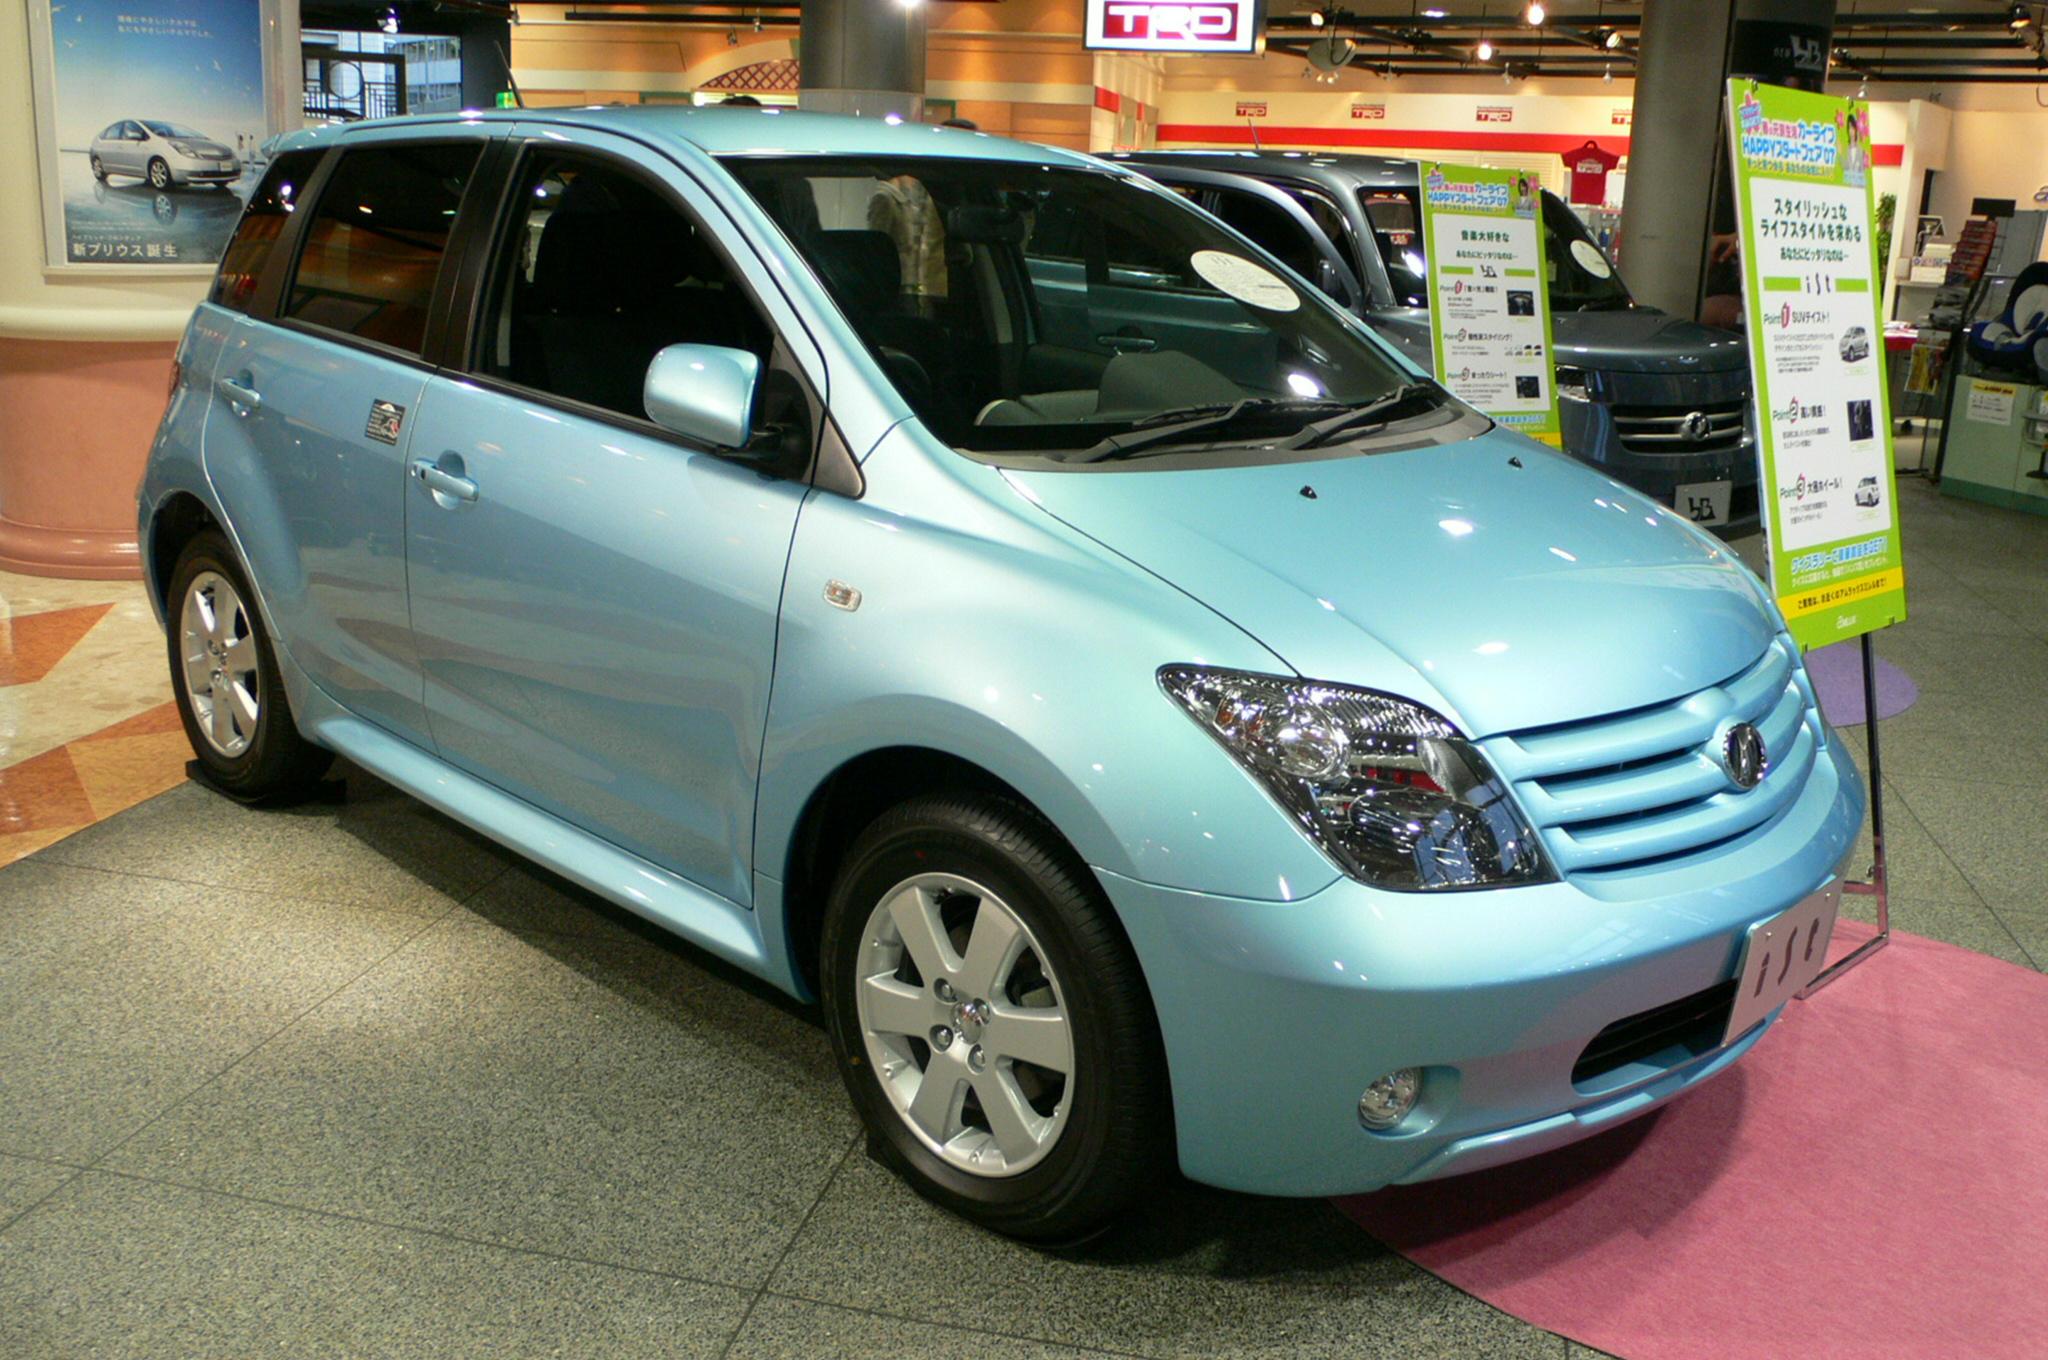 Toyota Ist 2014 Photo - 1